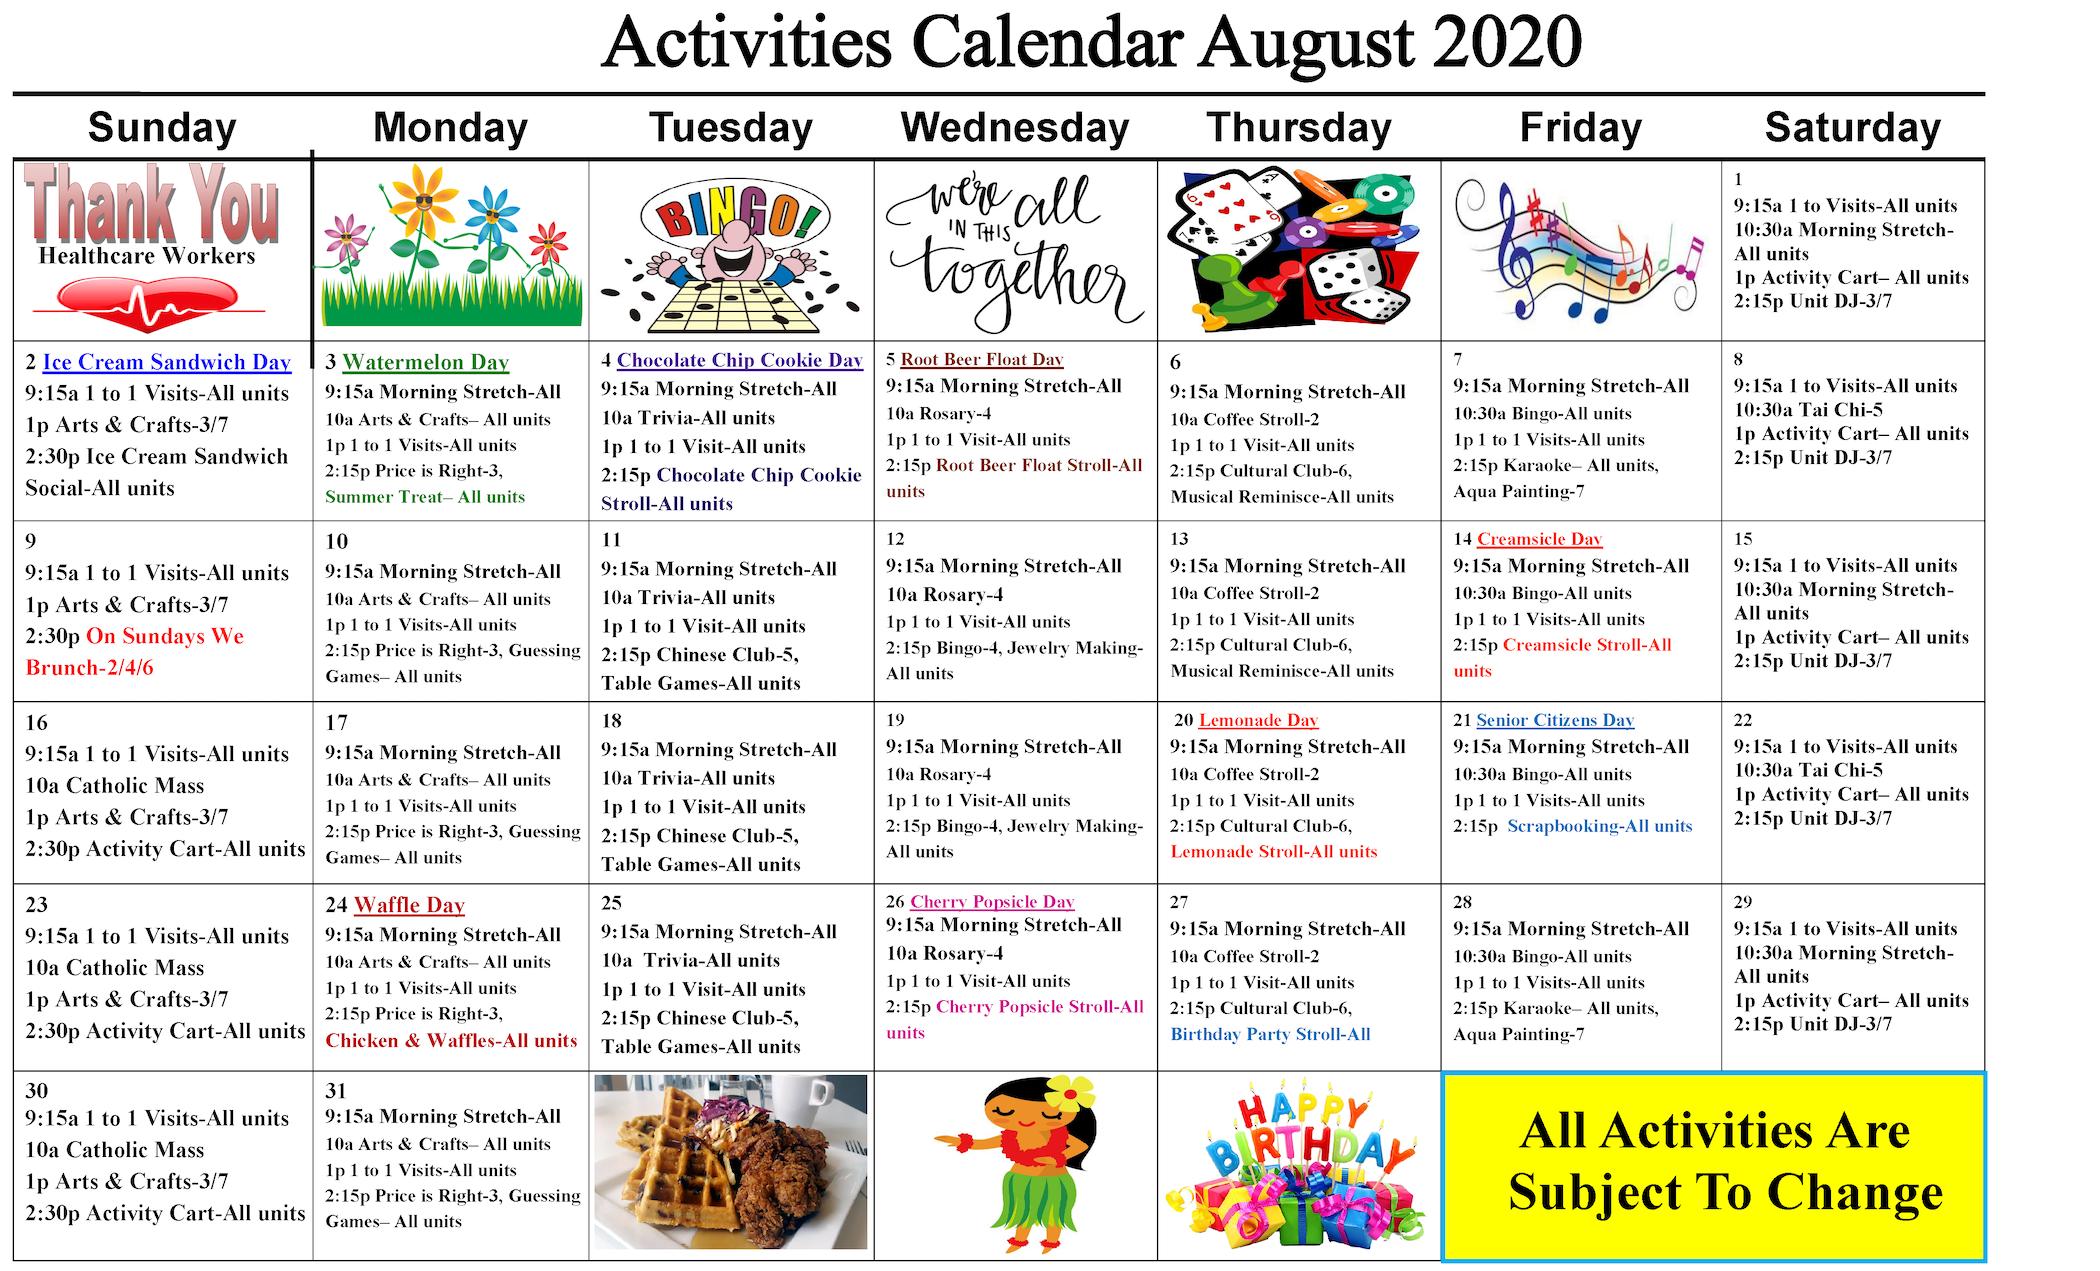 Activities Calendar for Cypress